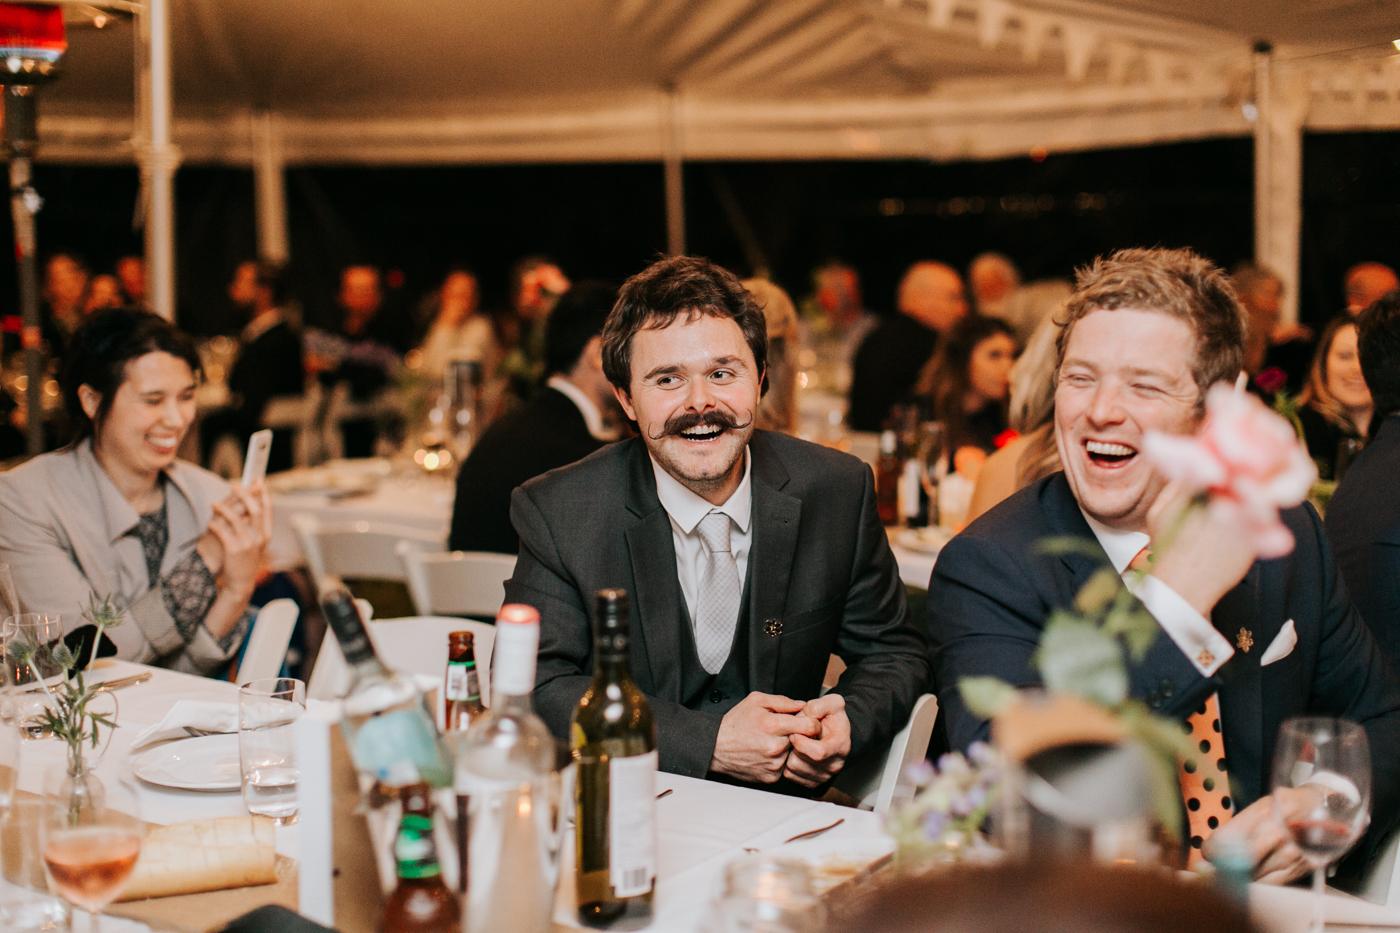 Bridget & James - Orange Country Wedding - Samantha Heather Photography-245.jpg